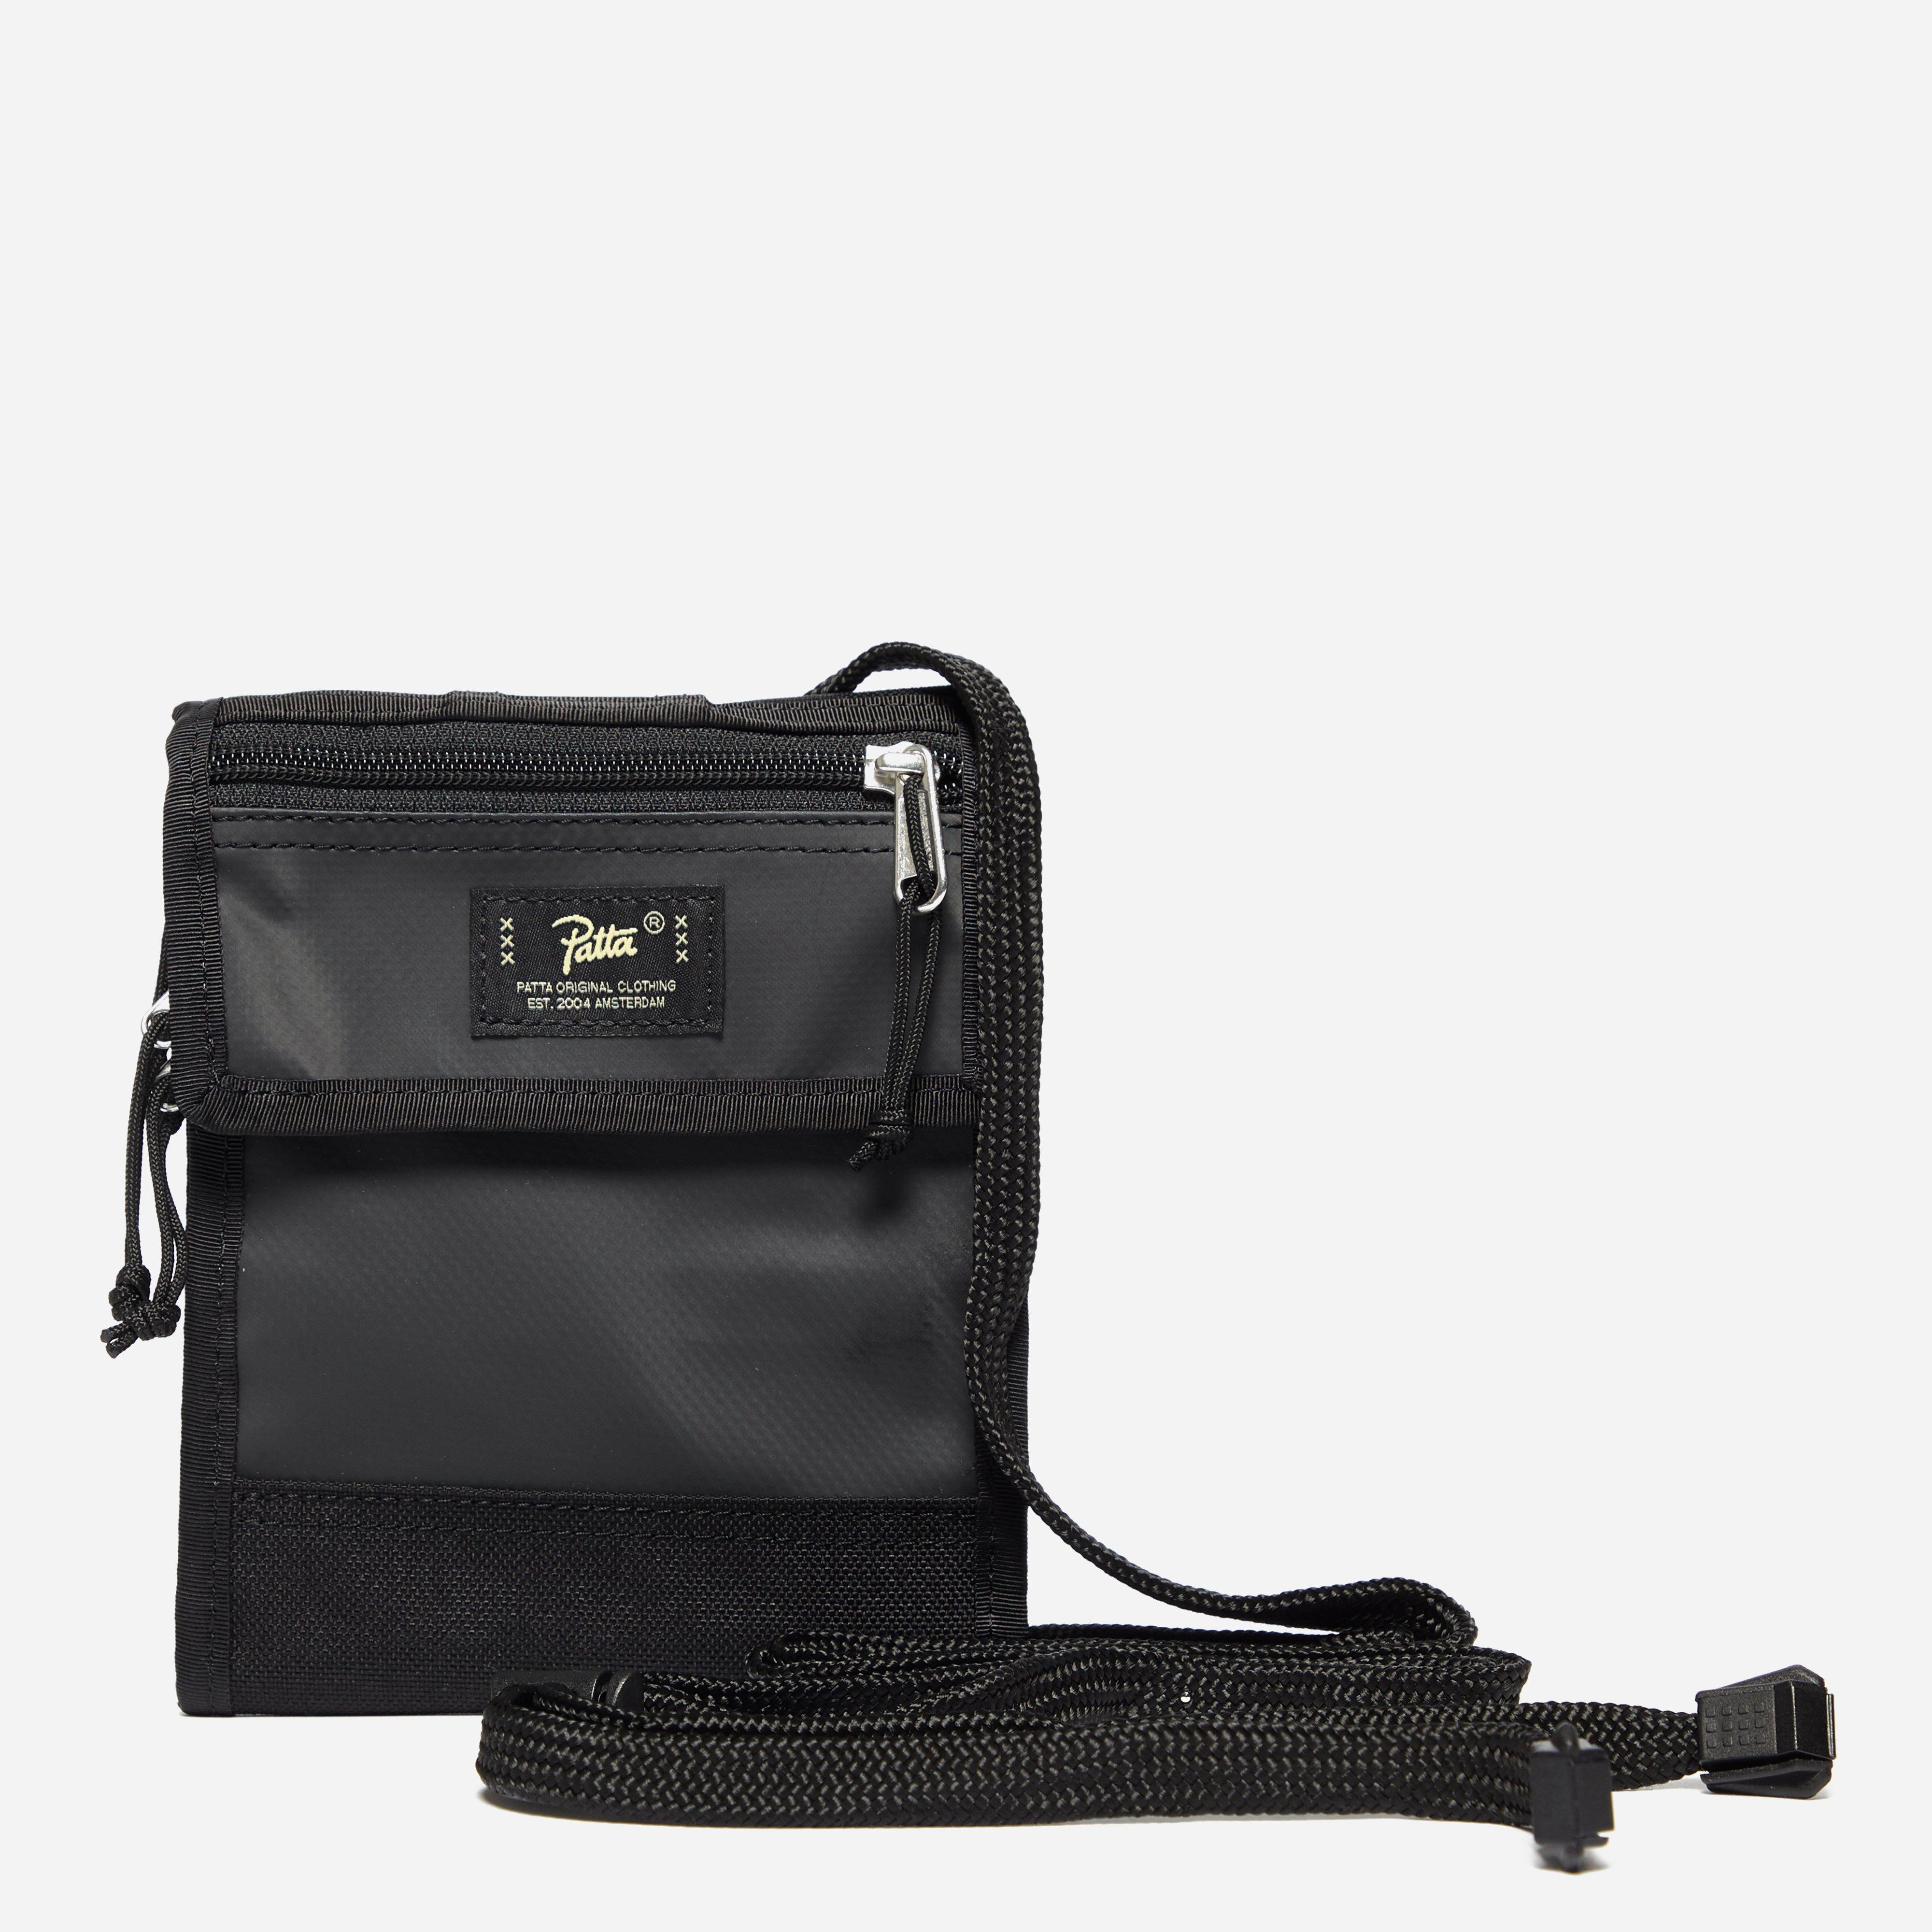 Patta LBN Neck Wallet Bag